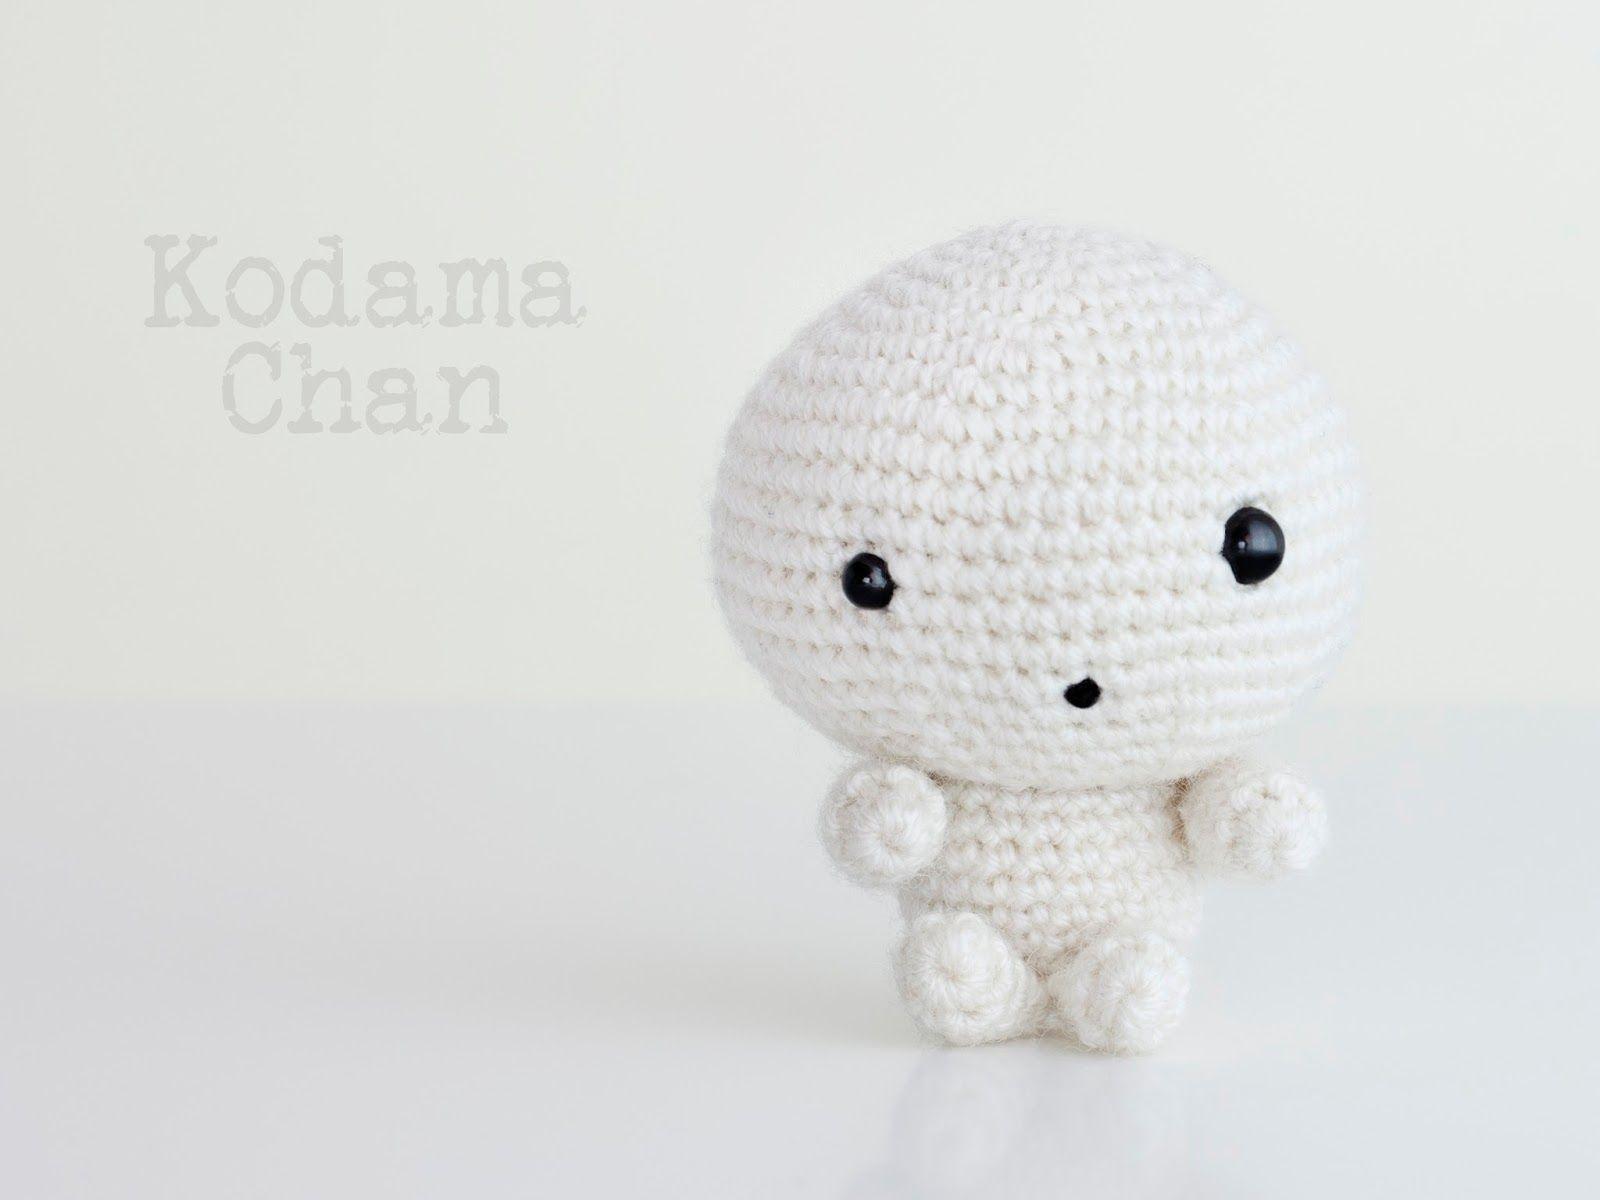 Amigurumi Kodama Chan - FREE Crochet Pattern / Tutorial | FREE ...